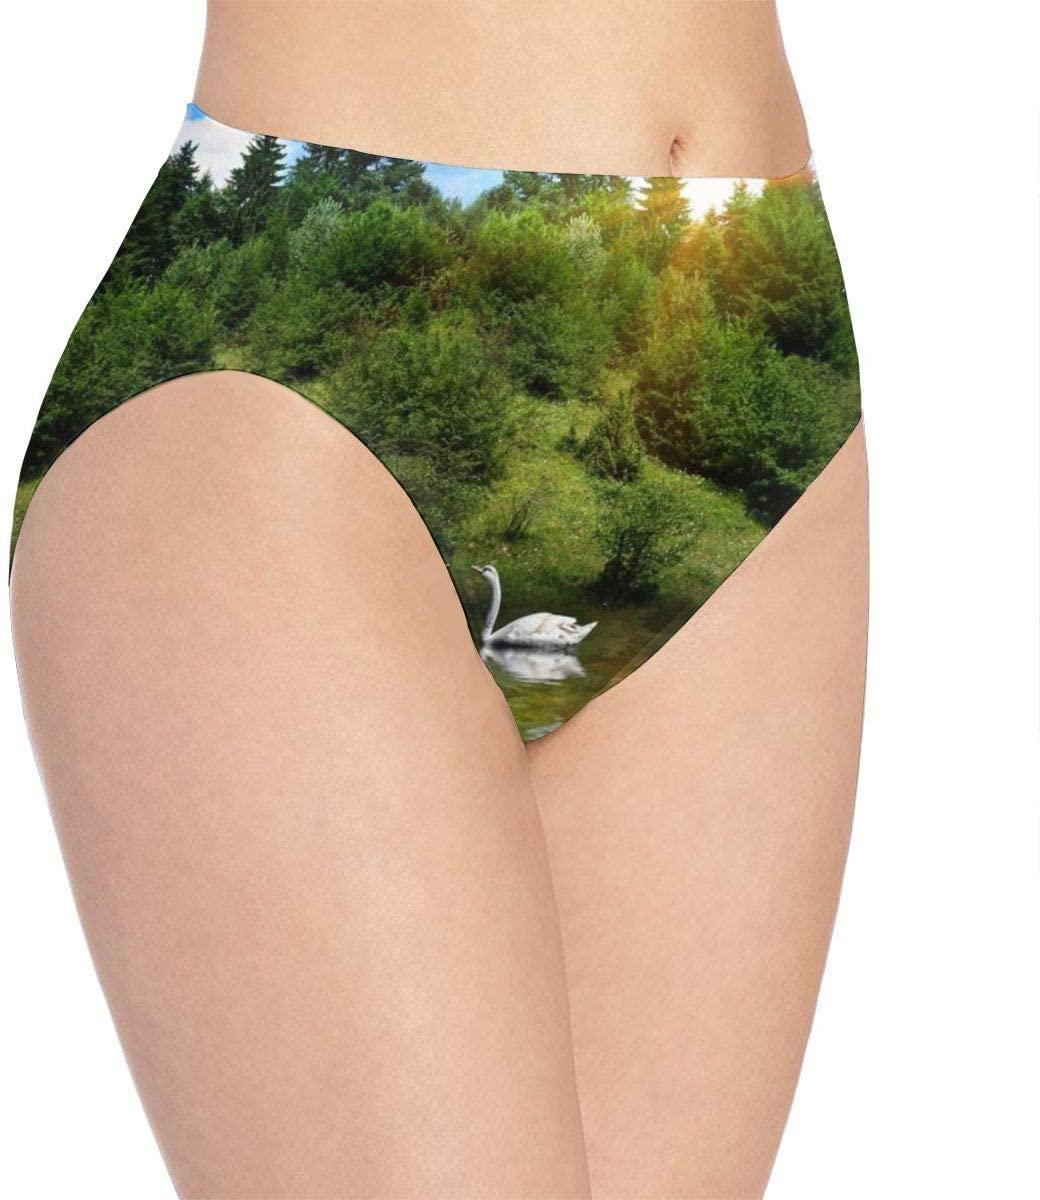 Kjaoi 3D Print Soft Women's Underwear, Duck in The Lake Fashion Flirty Sexy Lady's Panties Briefs